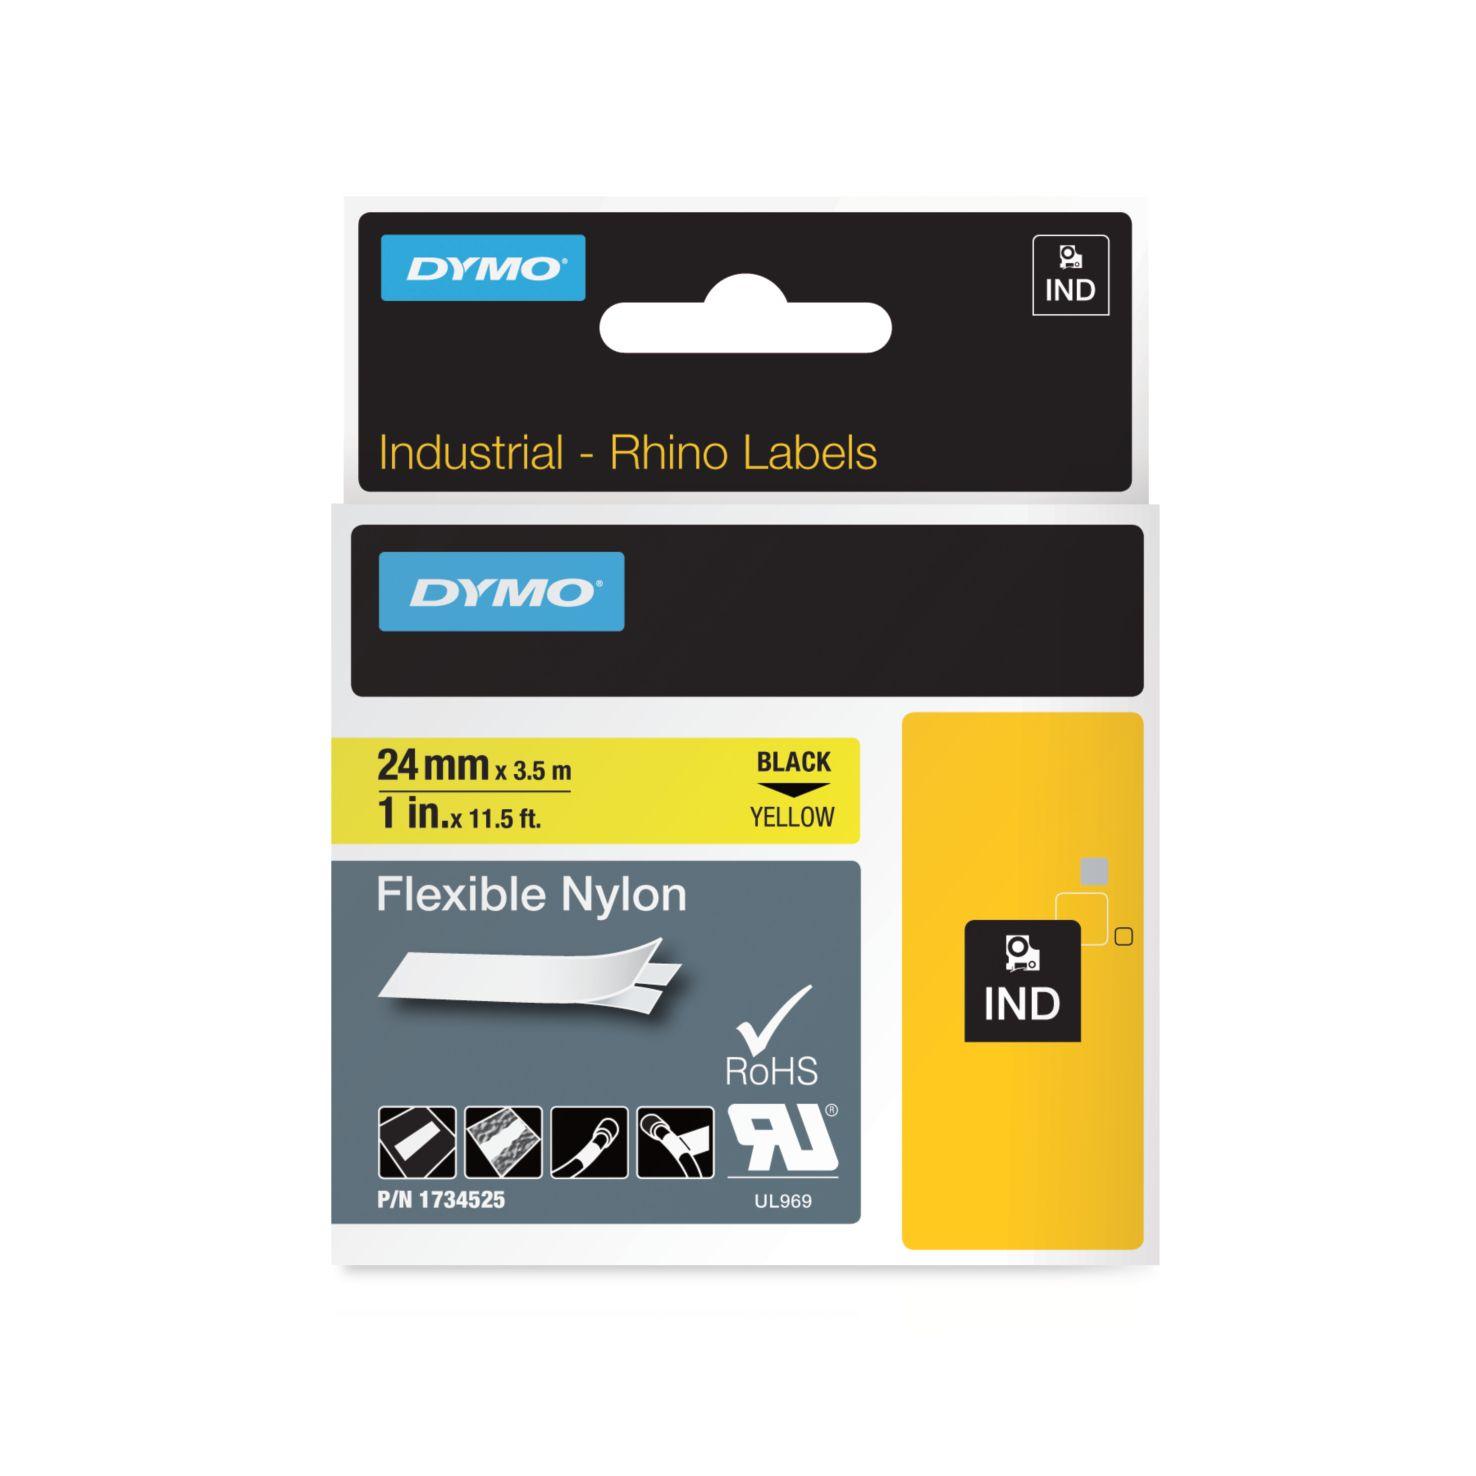 Dymo Rhino-Schriftband Nylon 24mm x 3,5m schwarz auf gelb